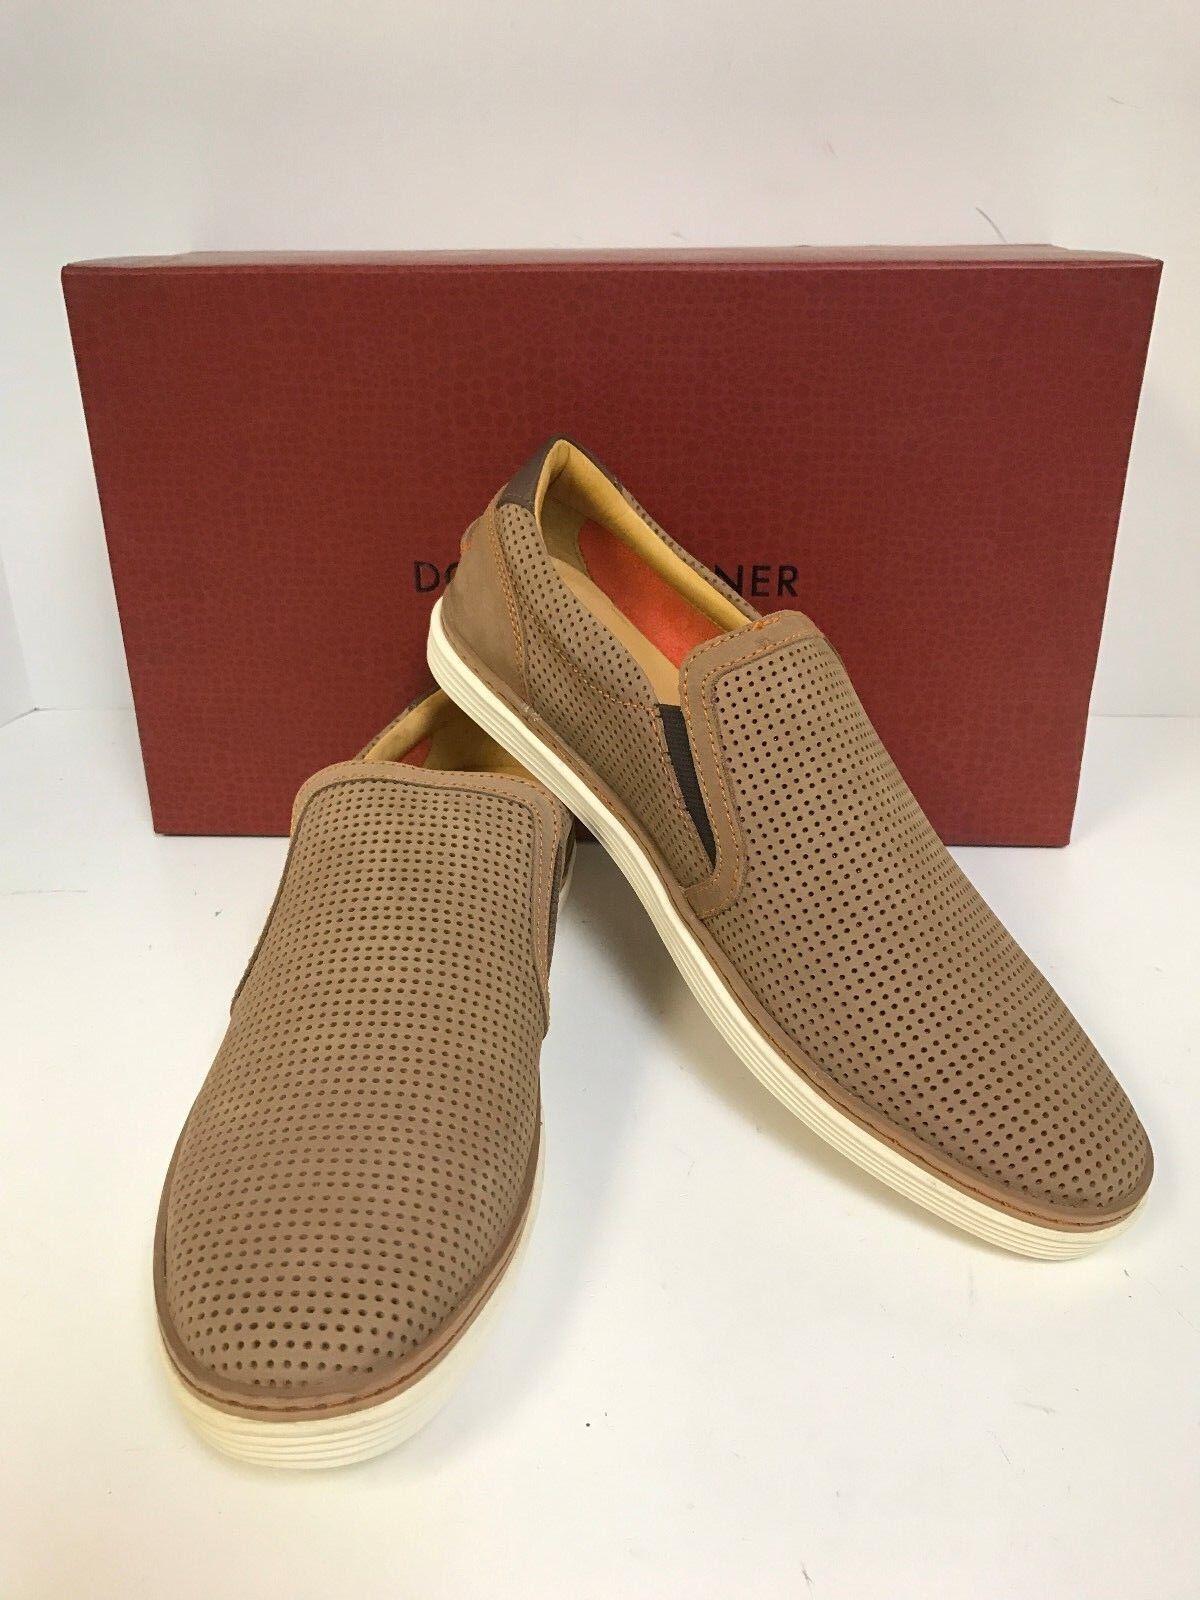 Donald Pliner Travis-03 Brown Perfed Nubuck Slipon Sneaker - Men's